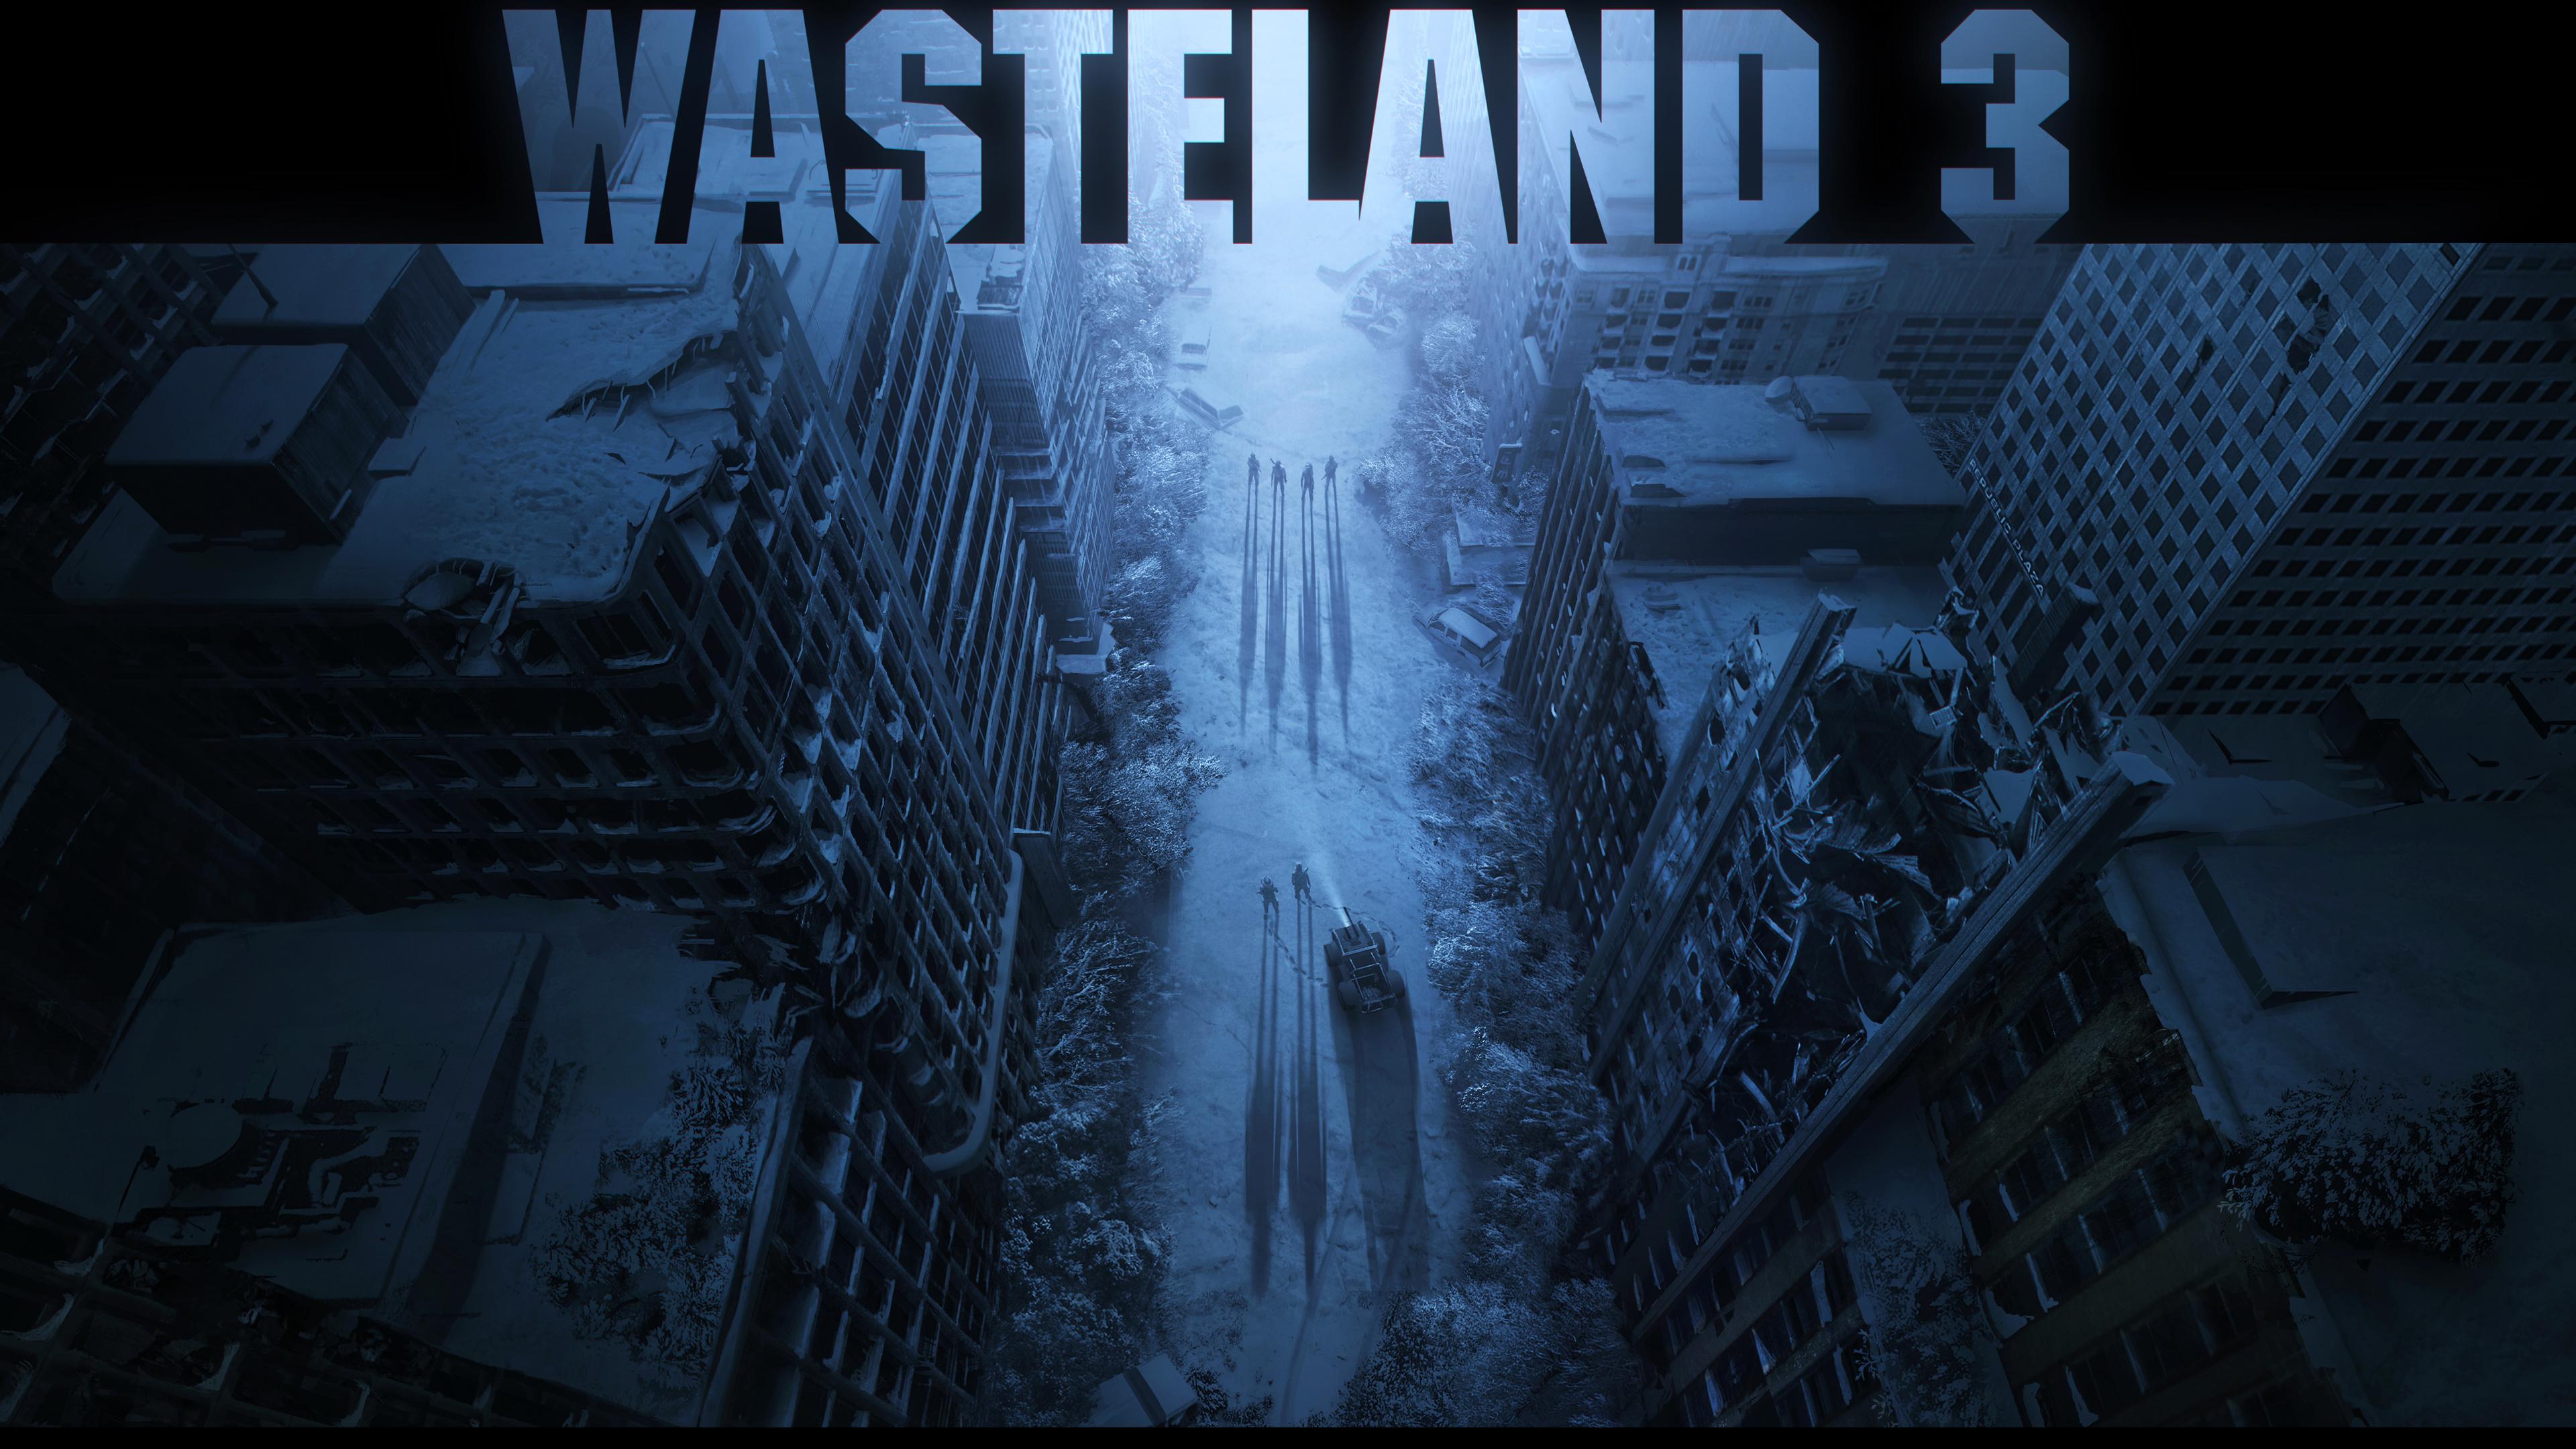 wasteland 3 game 2019 1535966048 - Wasteland 3 Game 2019 - wasteland 3 wallpapers, games wallpapers, 5k wallpapers, 2019 games wallpapers